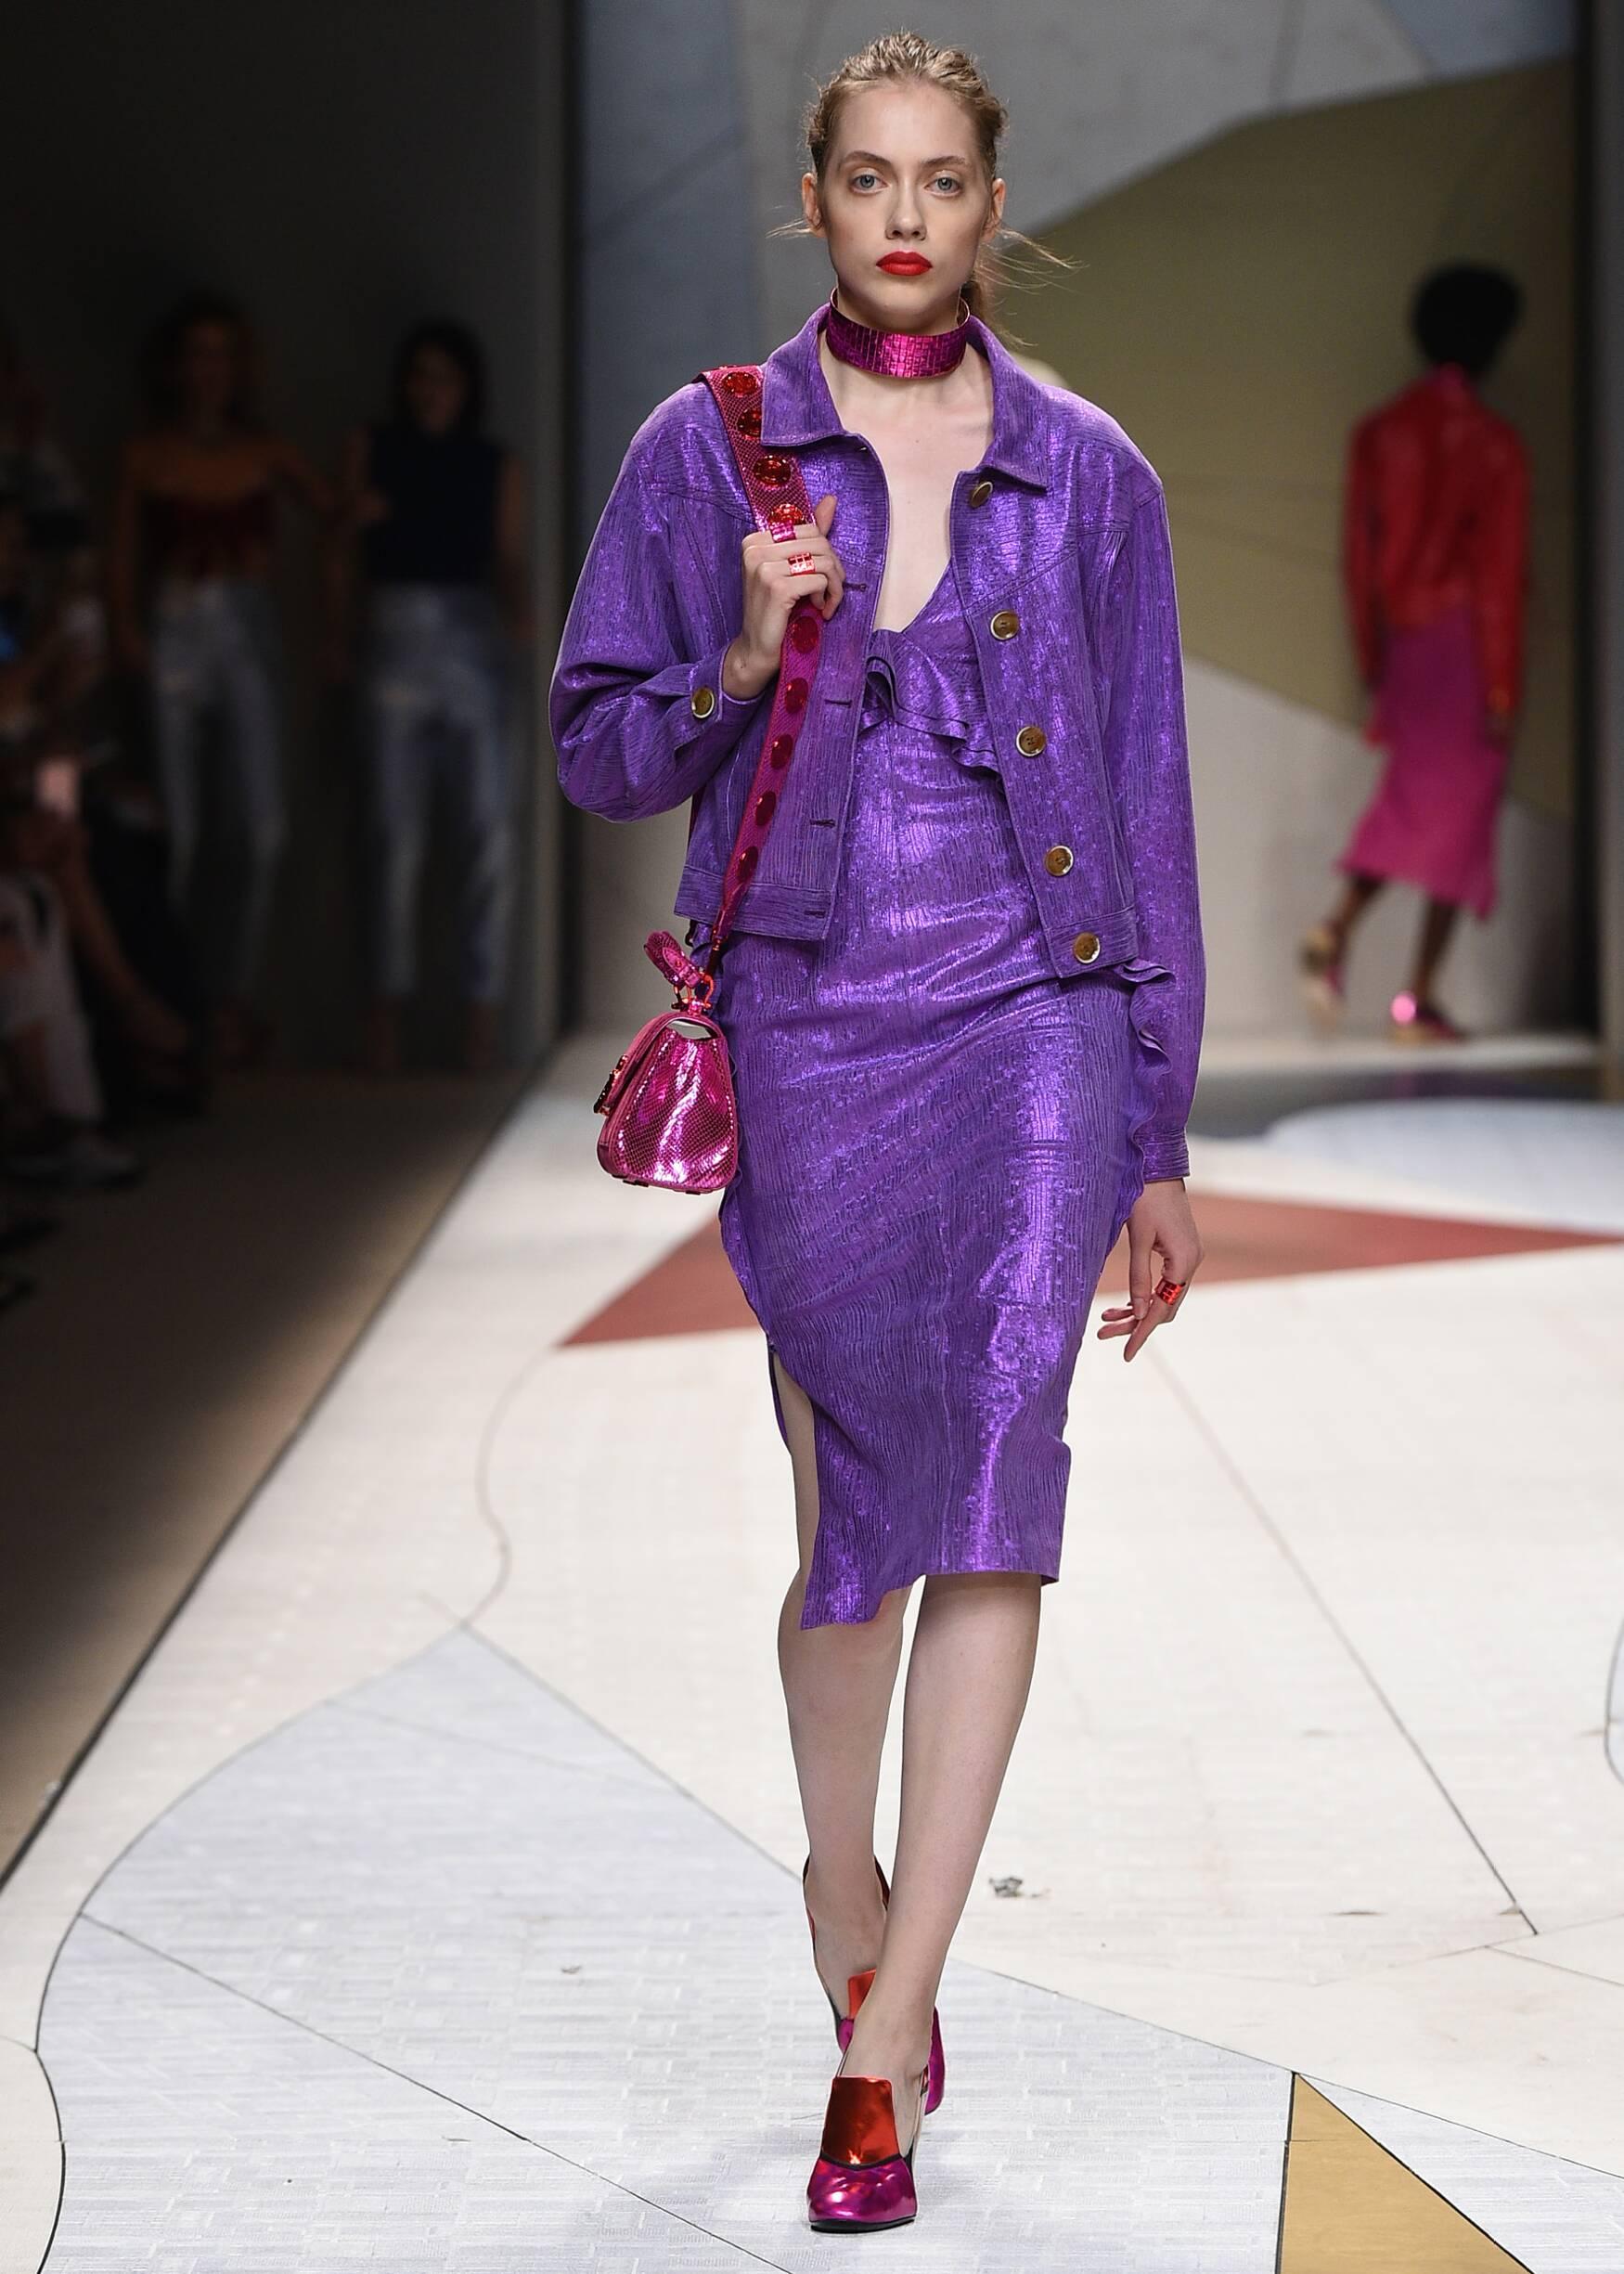 Model Fashion Show Trussardi